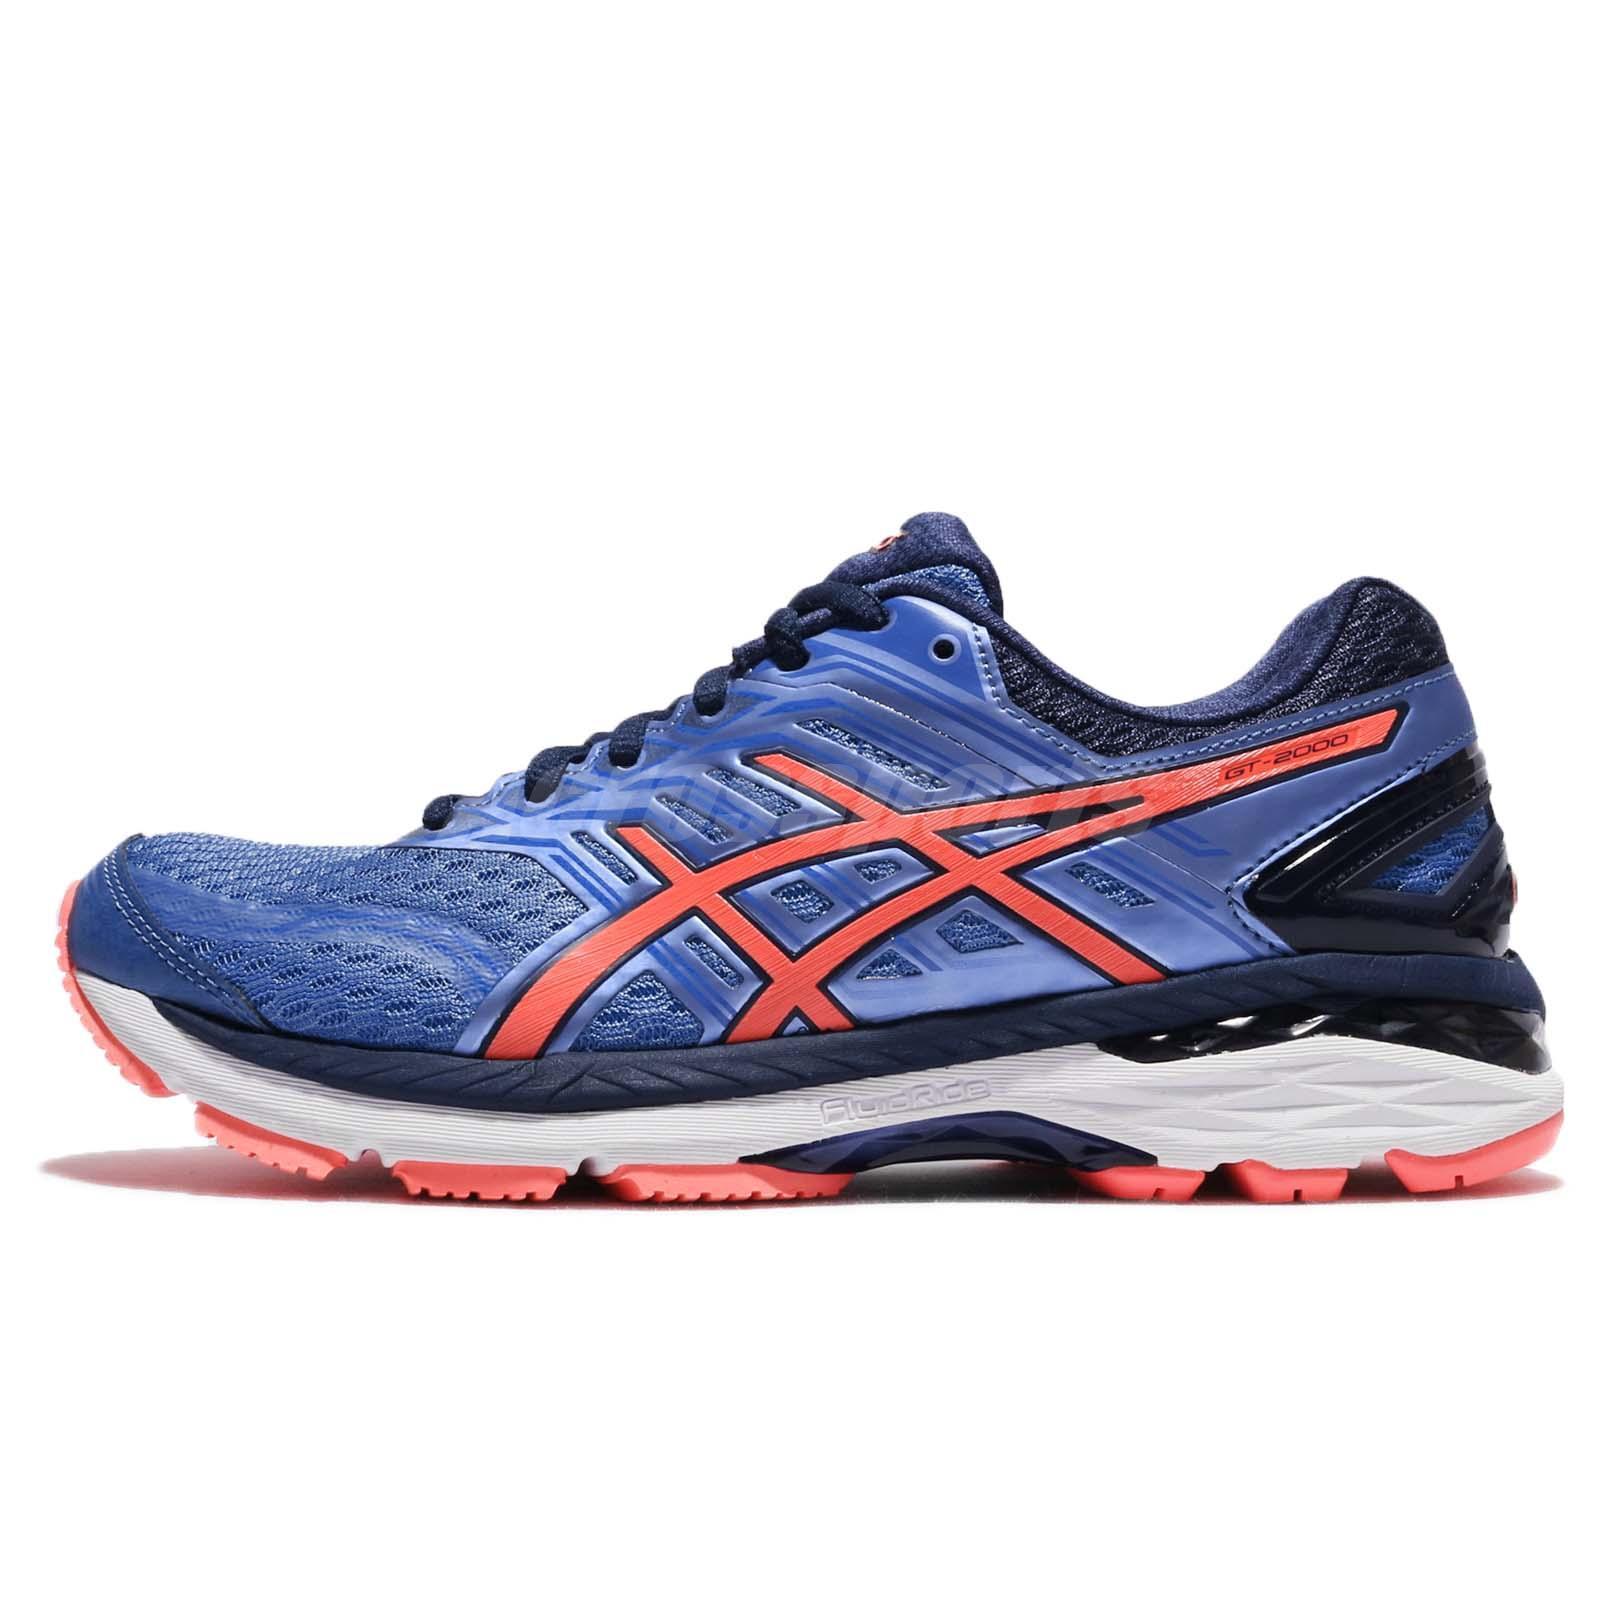 22b3577593 Asics GT-2000 5 Regatta Blue Flash Coral Women Running Shoes Sneakers T757N -4006